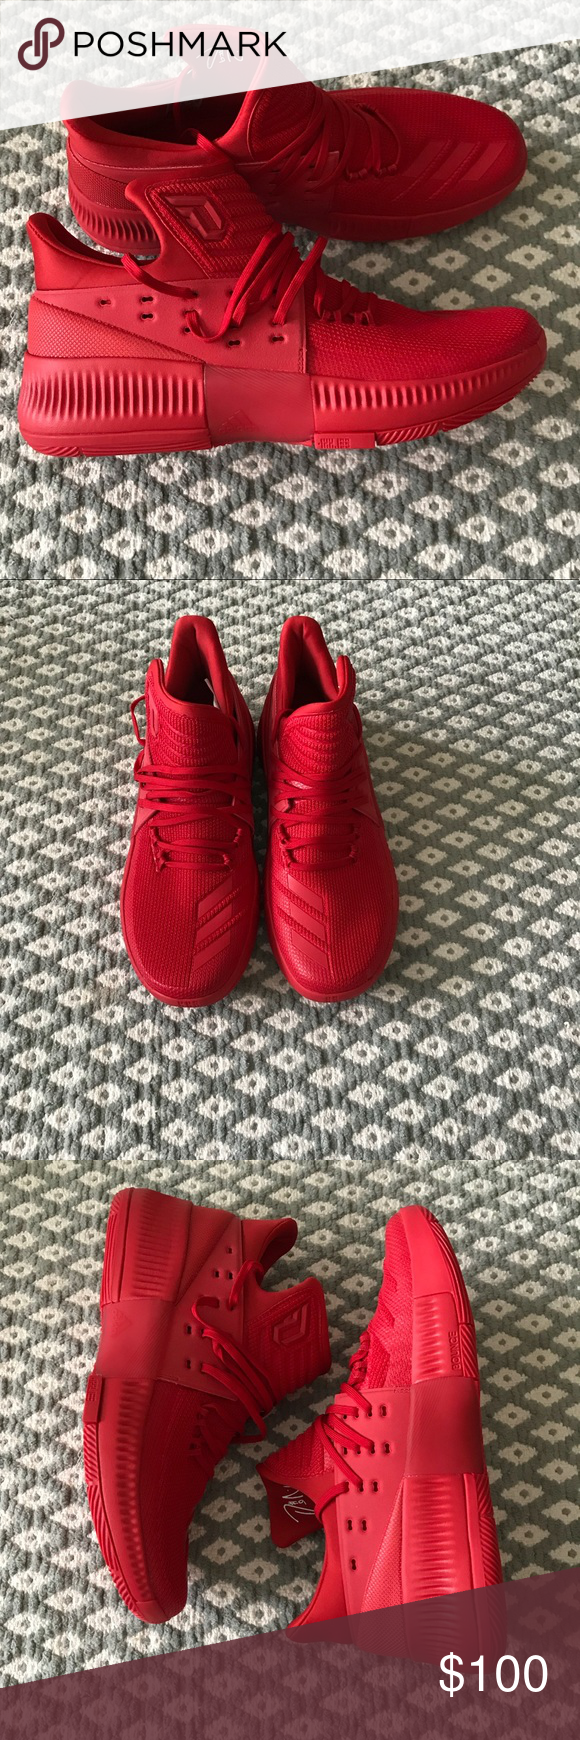 Adidas D Lillard Dame 3 Rip Città Cesto Rosso Nwt Pinterest